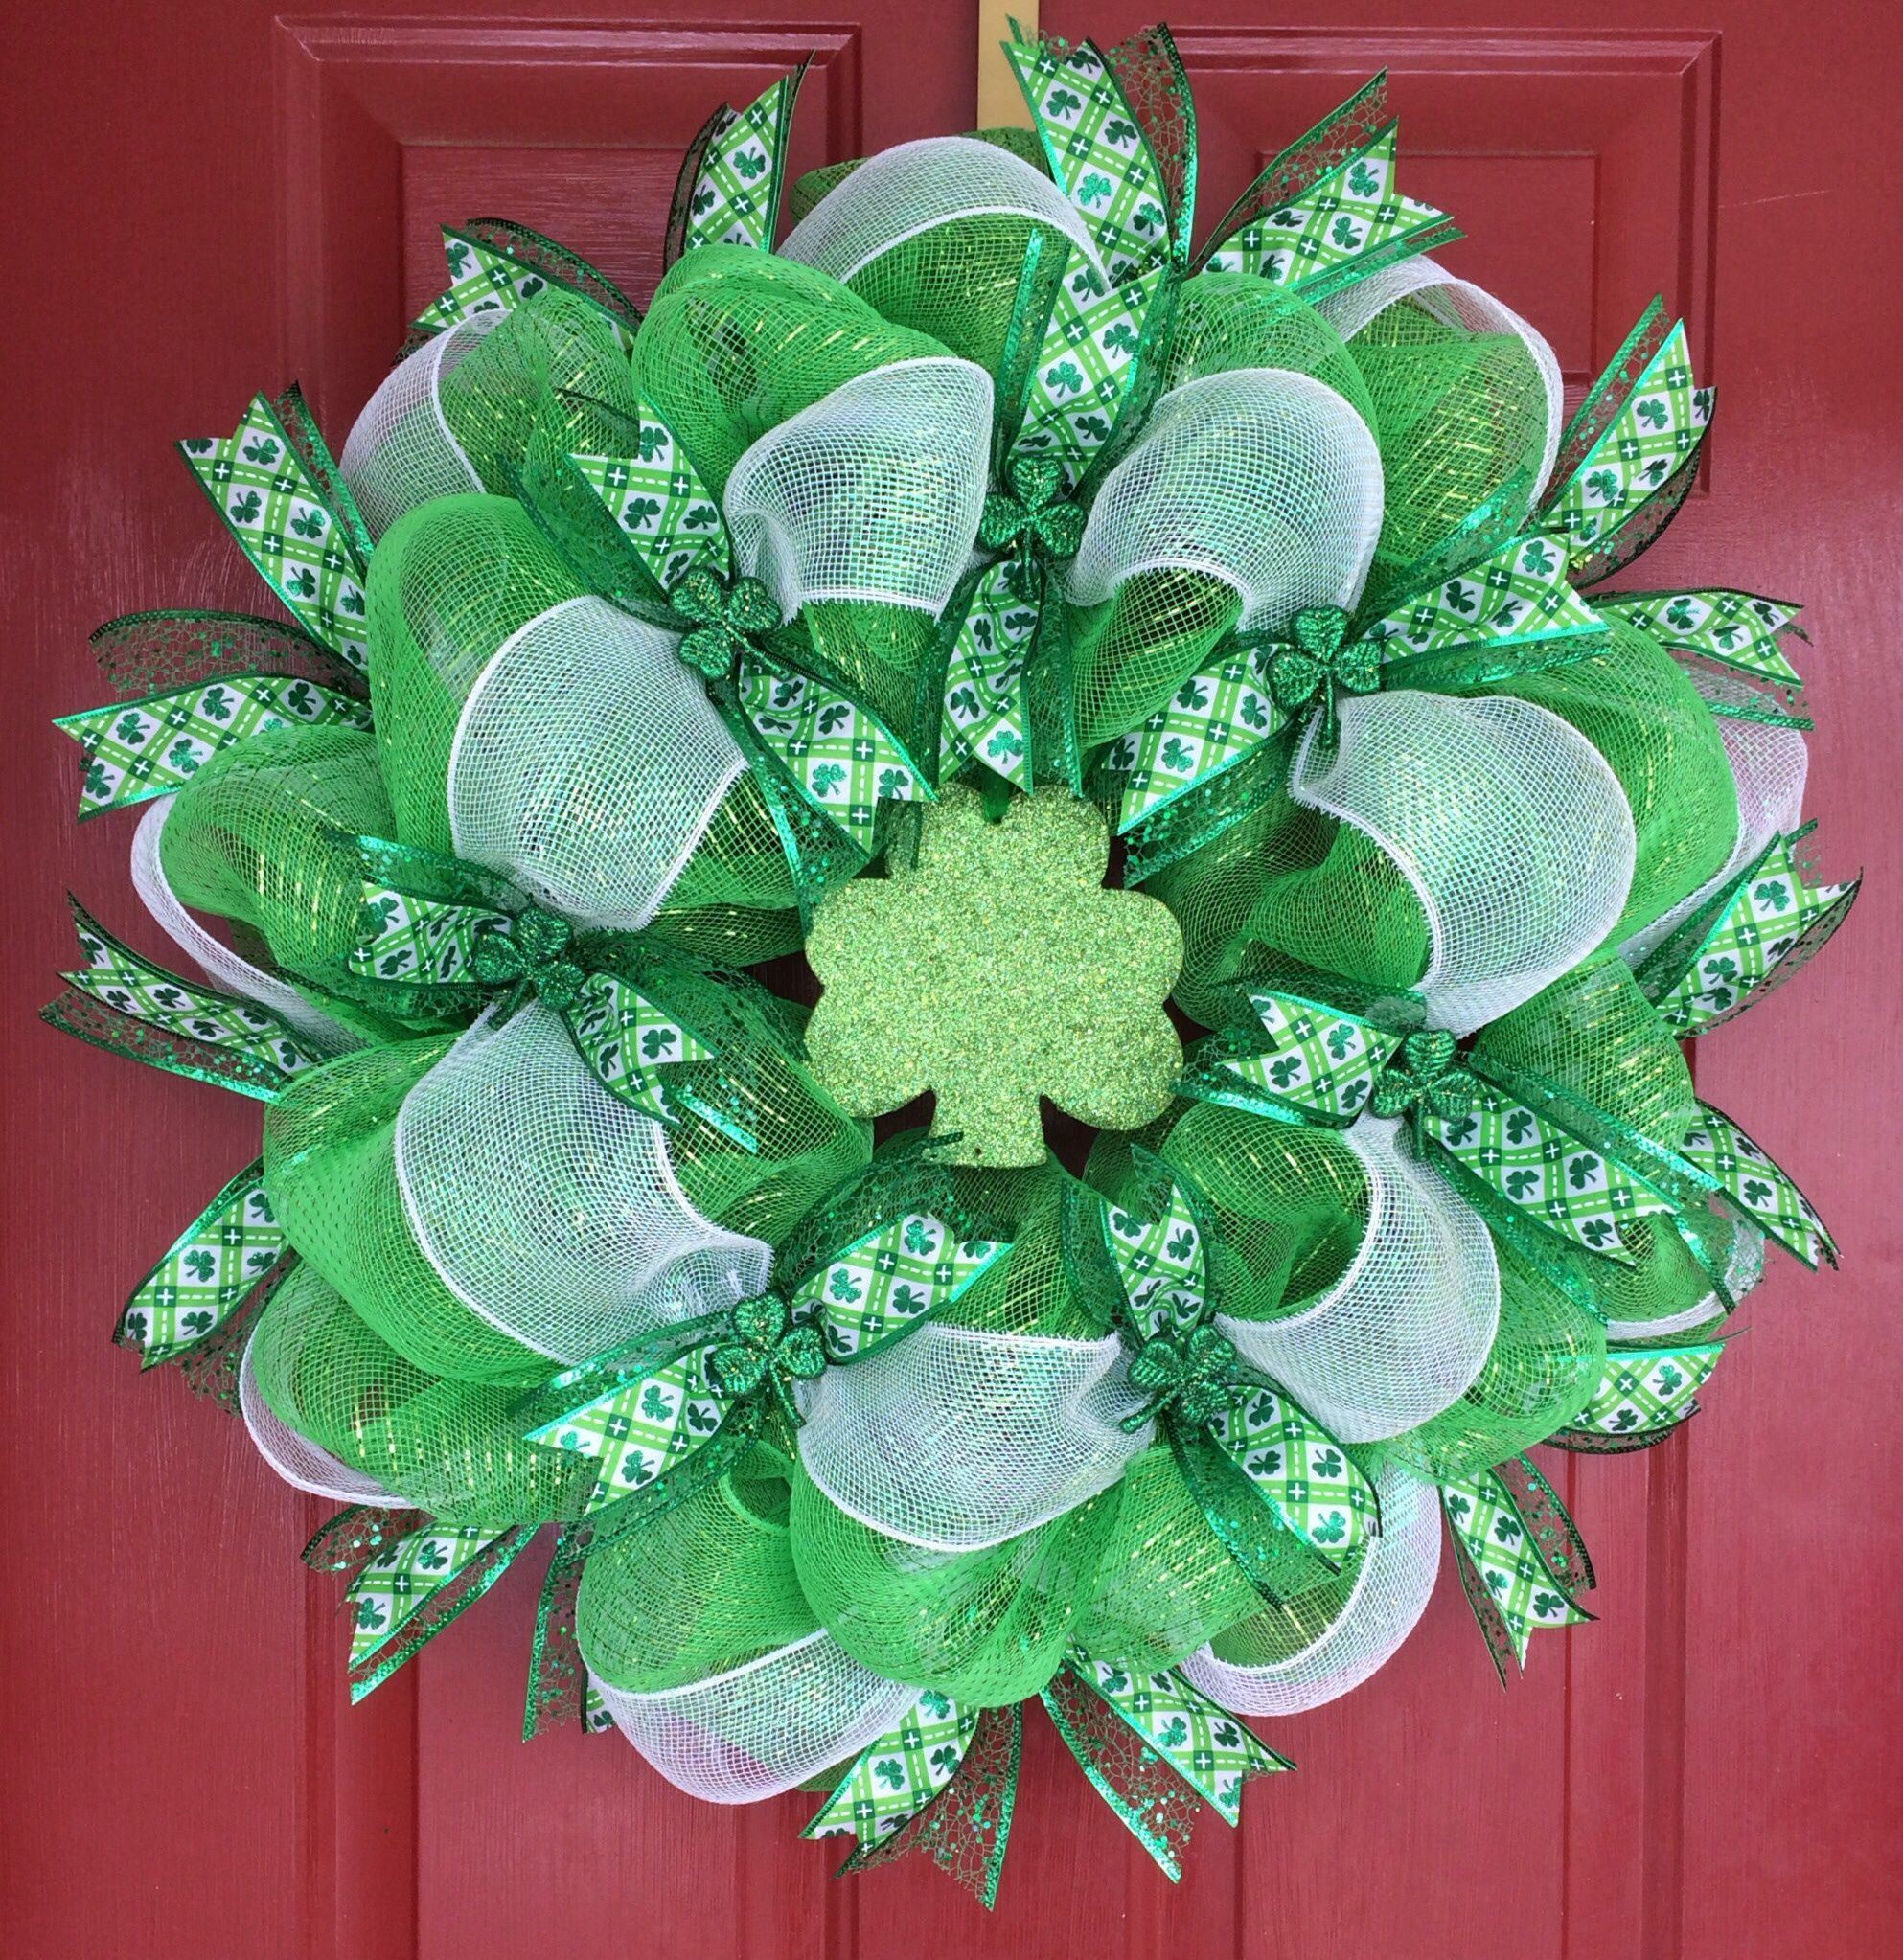 St. Patty's Shamrock wreath by KA Wreath Design Diy